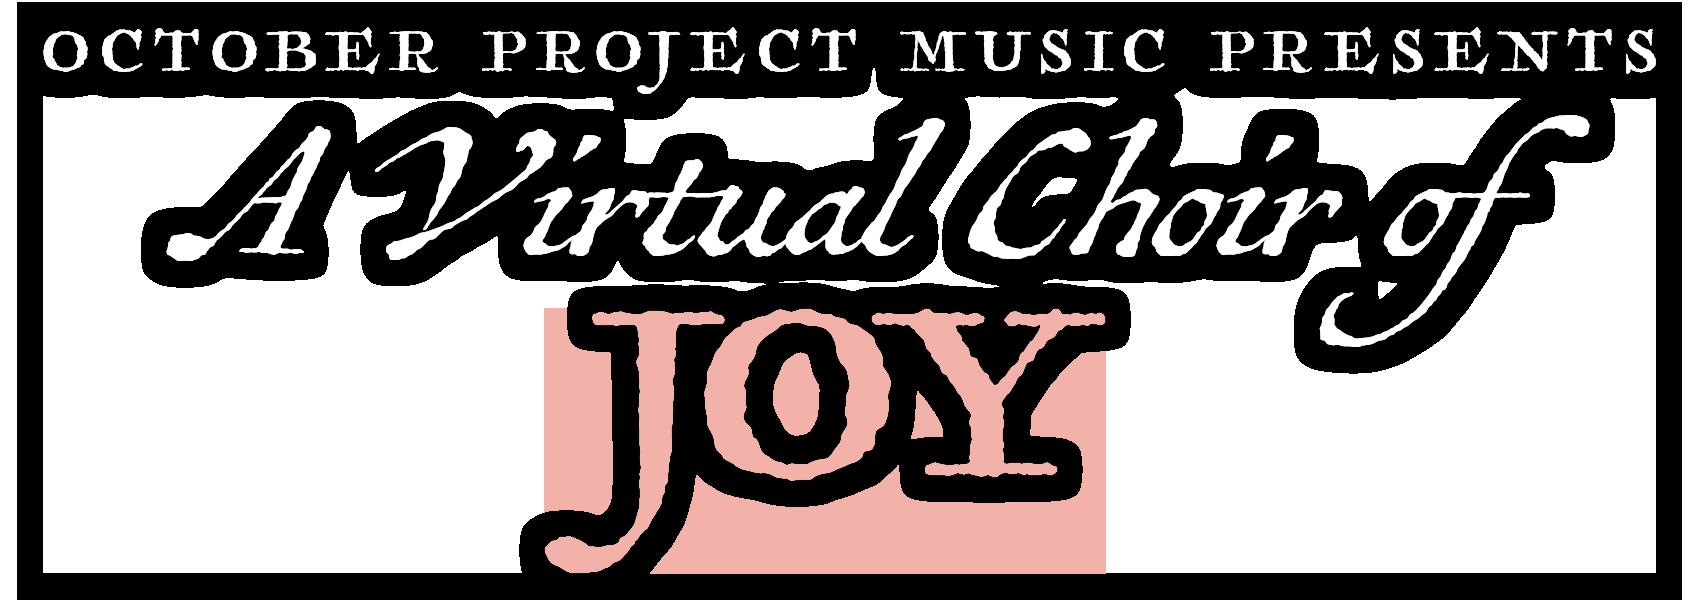 A Virtual Choir of JOY